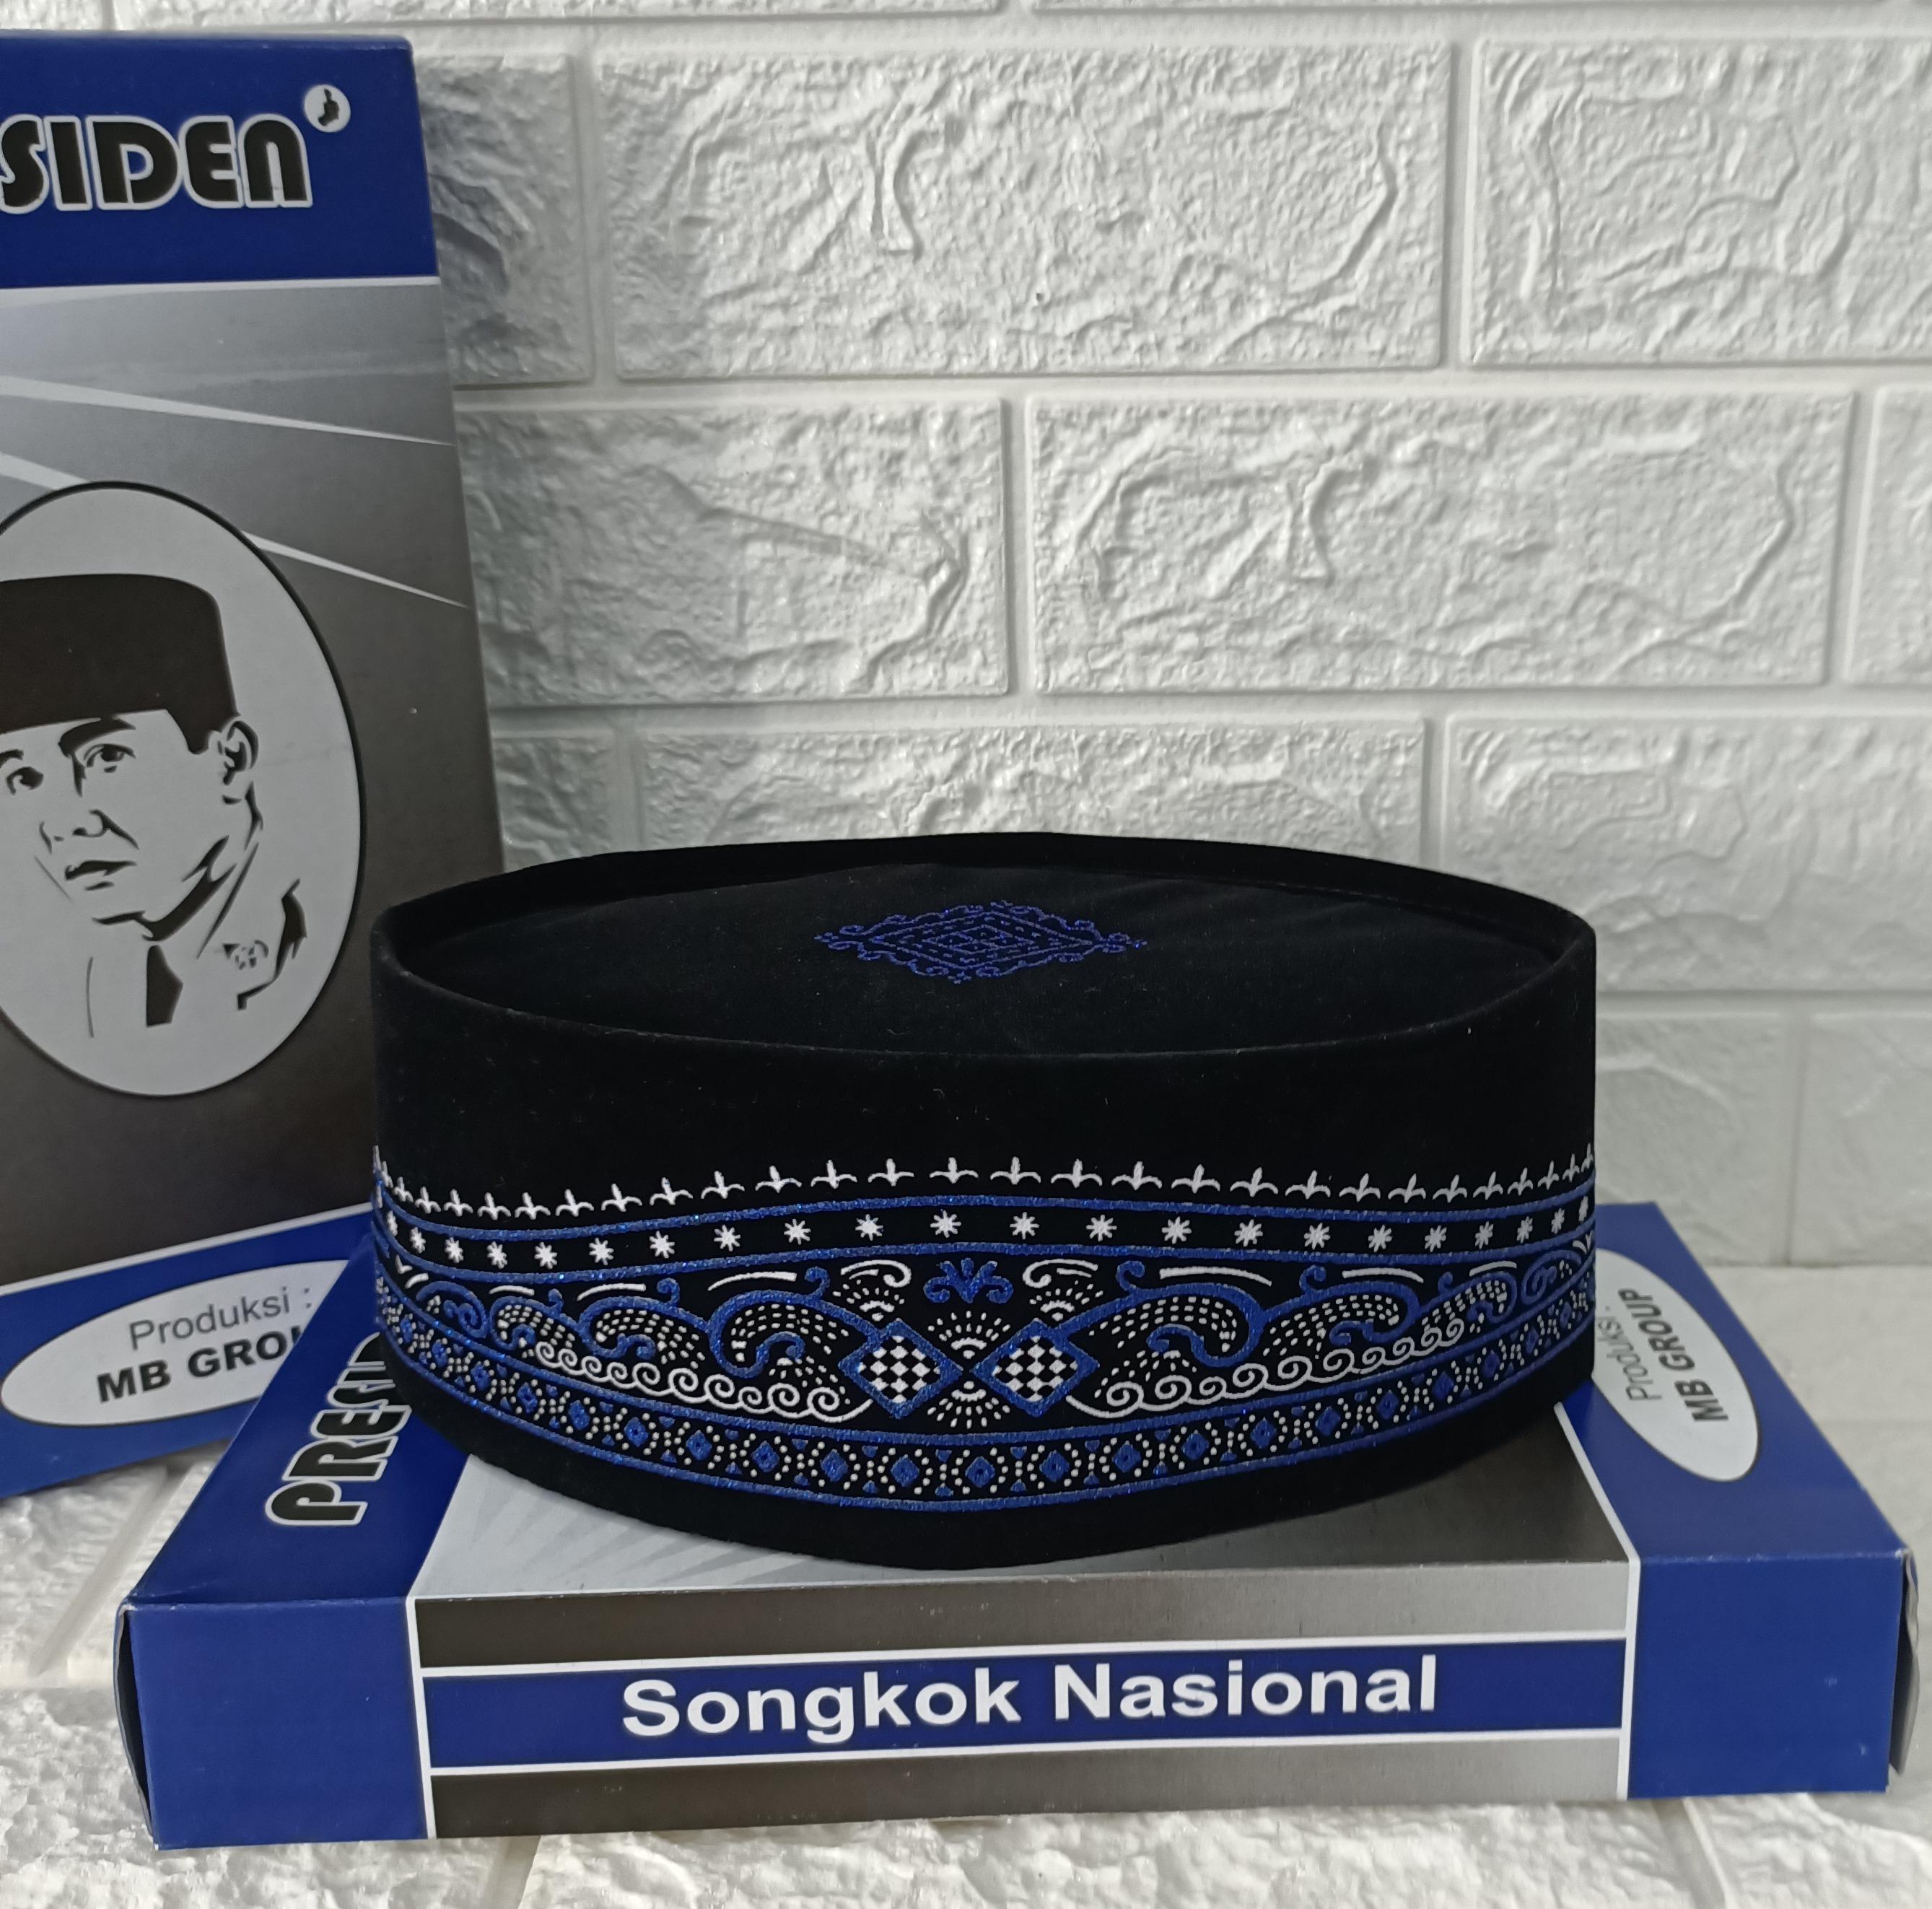 promo  peci kopiah songkok nasional hitam beludru motif batik warna biru-peci batik sablon warna biru bahan halus nyaman berkulitas-bisa bayar ditempat